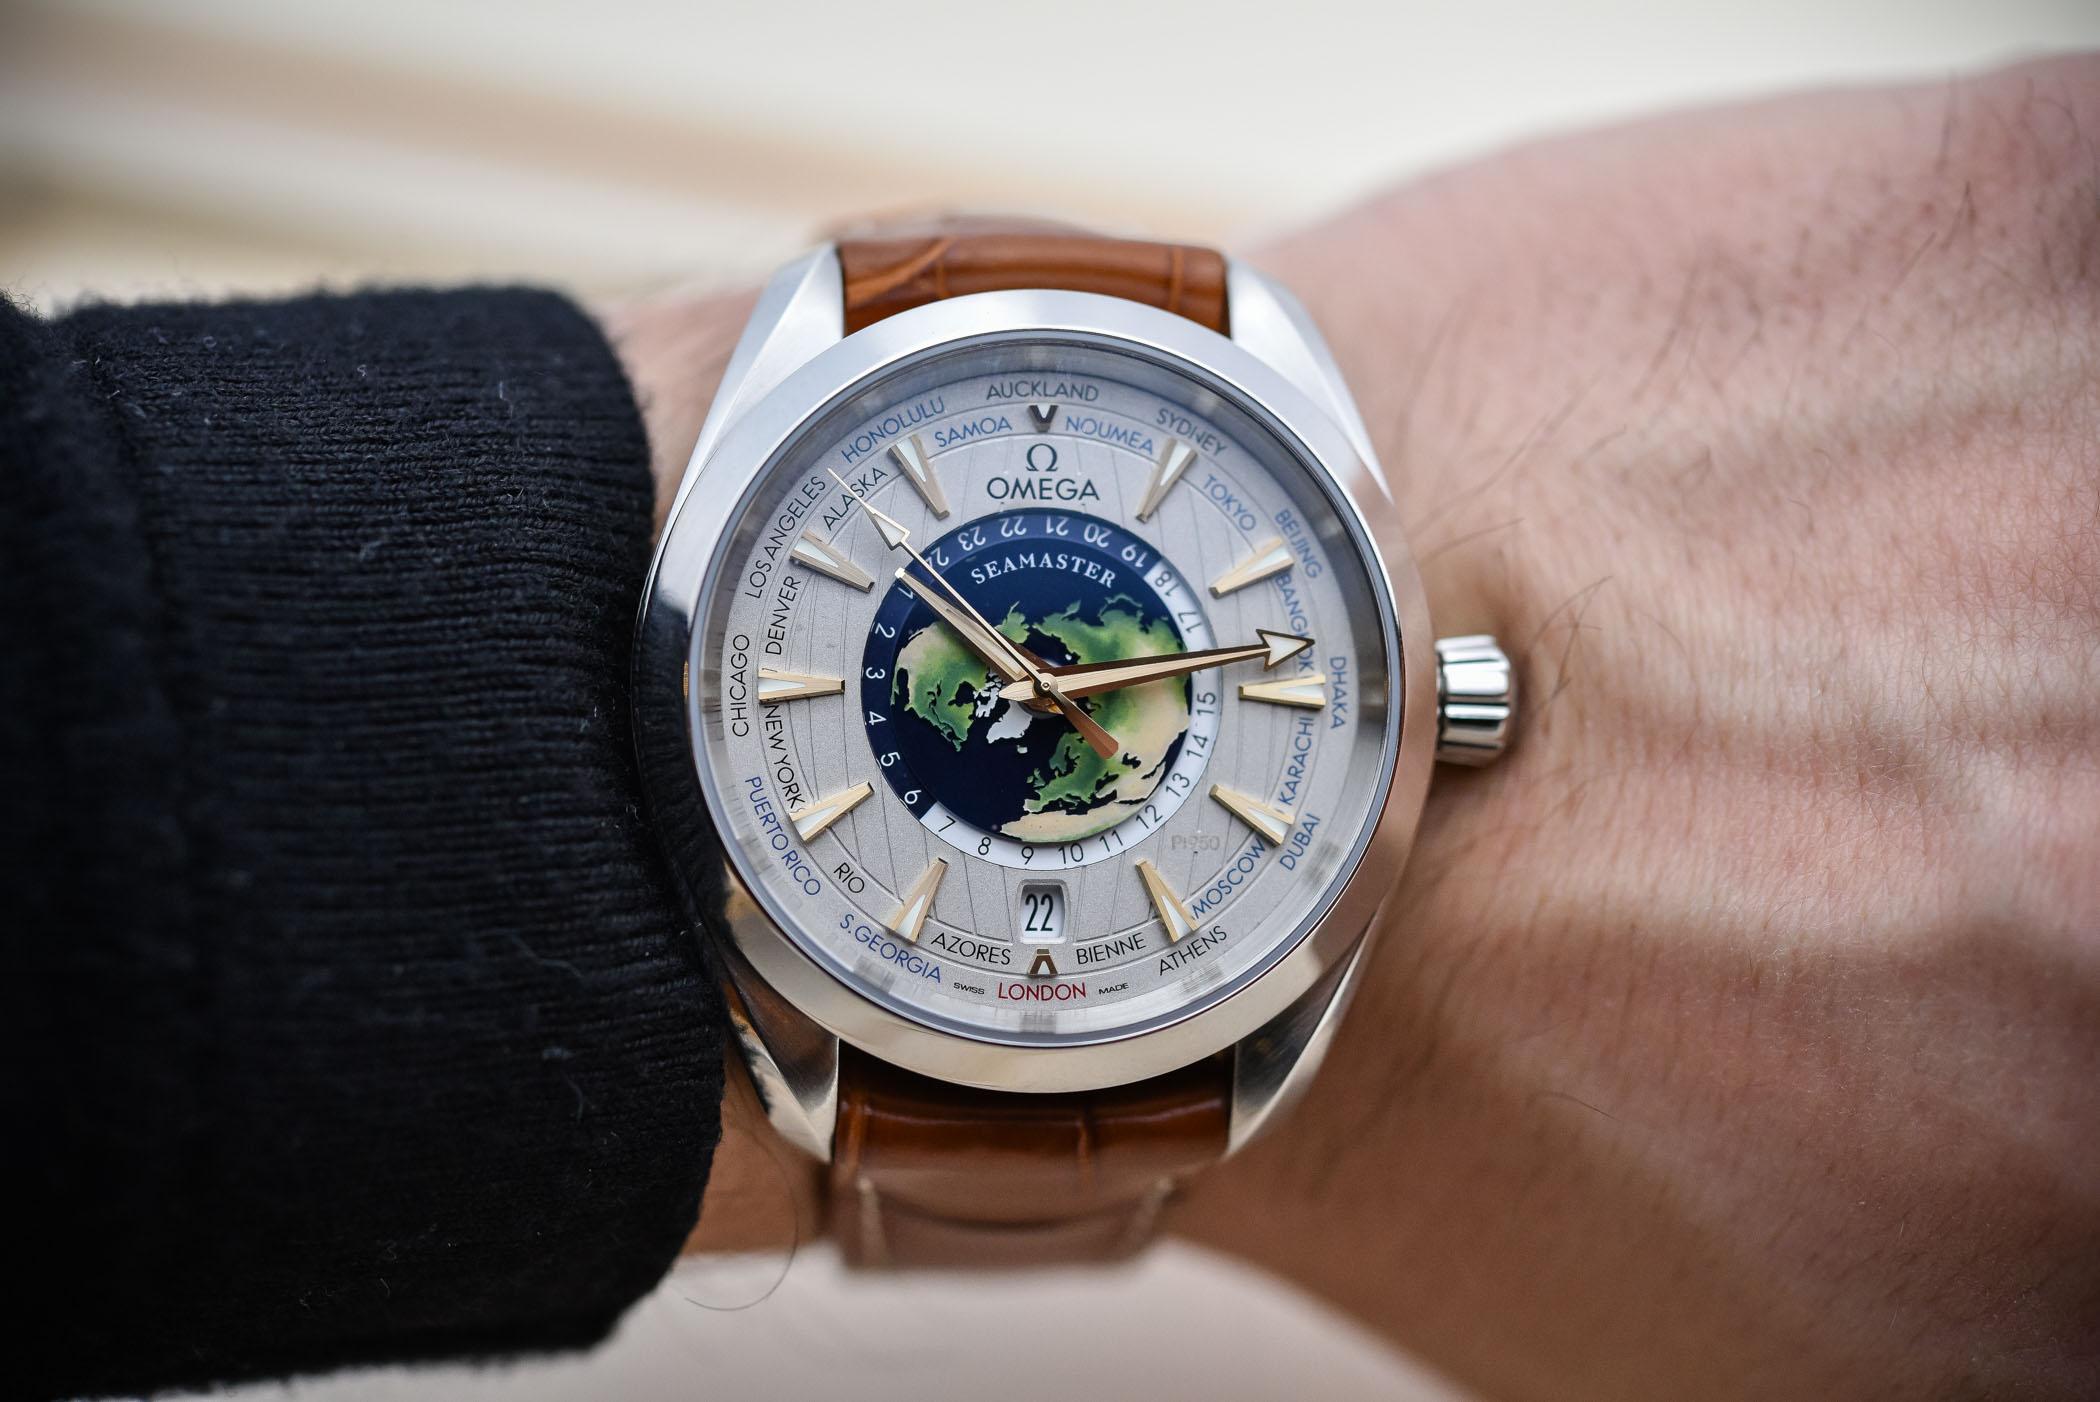 Omega Seamaster Aqua Terra Worldtimer Platinum - 220.93.43.22.99.001